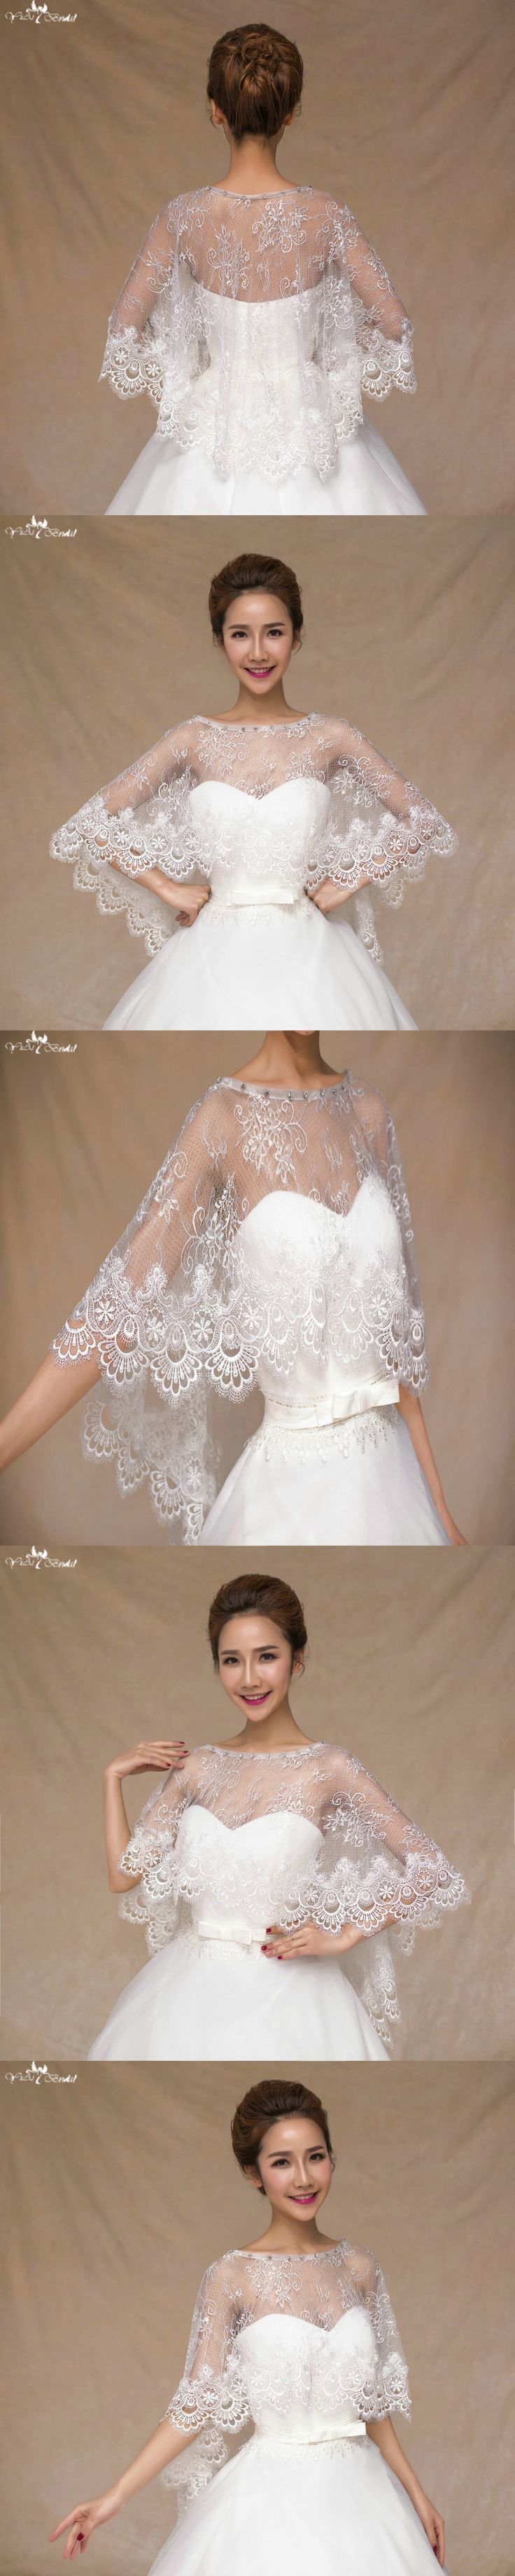 TA069 Applique Edge Soft Lace Rhinestone Shawl Cape Mariage Wedding Accessories